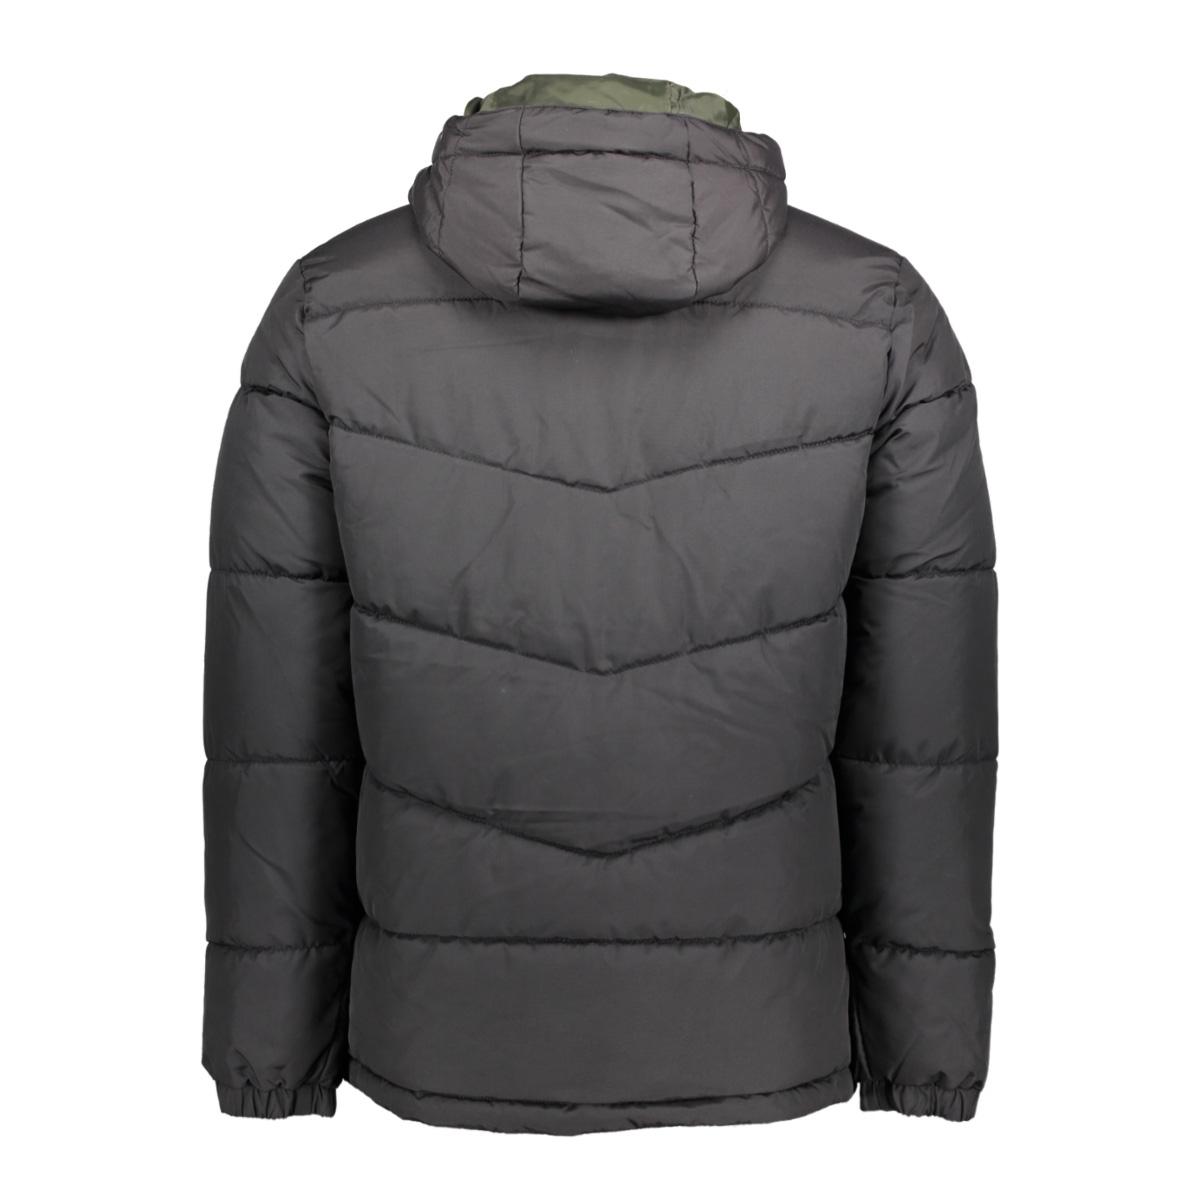 jcoroger jacket 12123927 jack & jones jas black/one